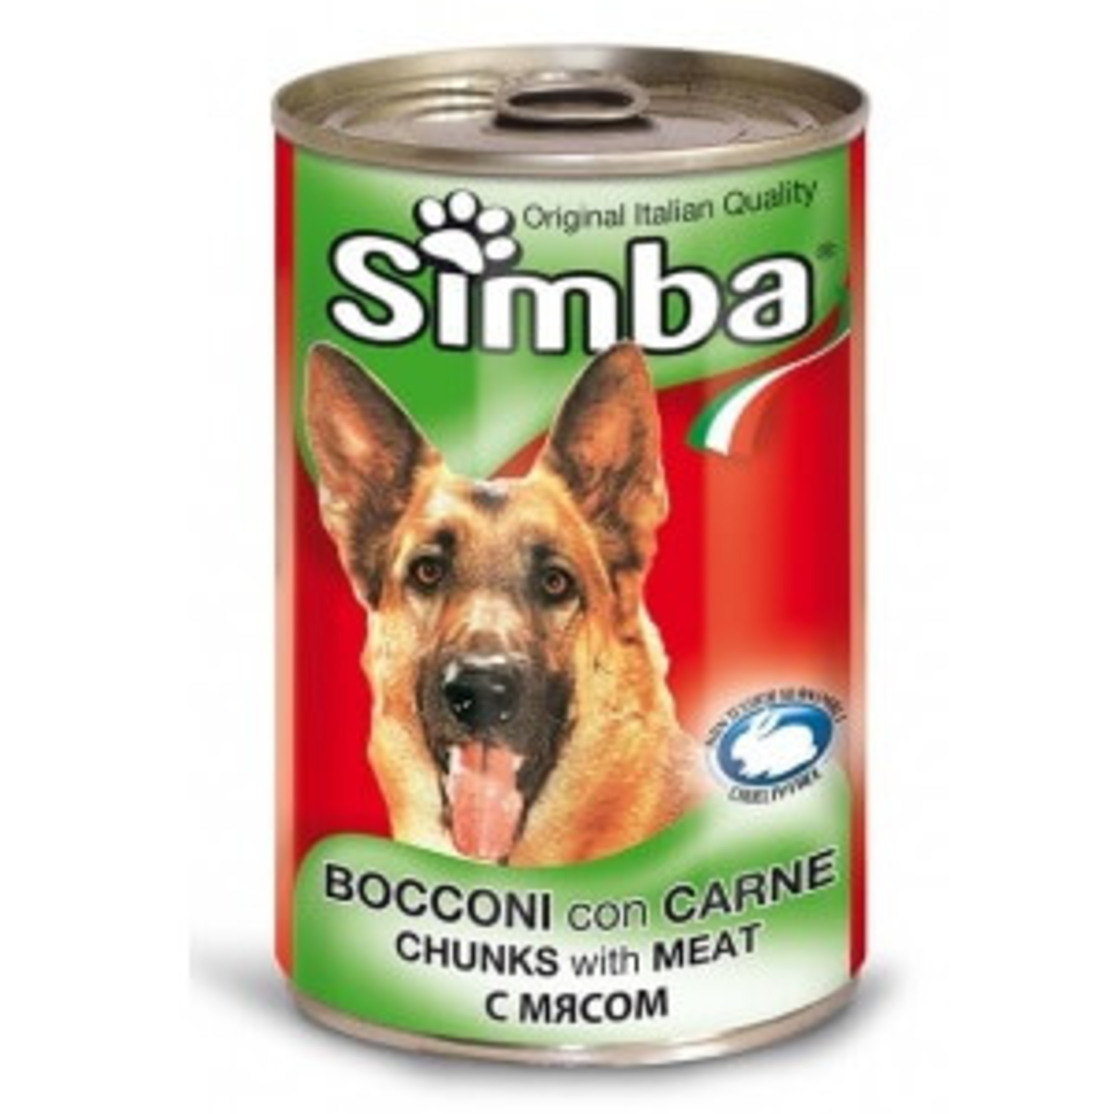 SIMBA סימבה מזון רטוב לכלב 415 גרם מגוון טעמים